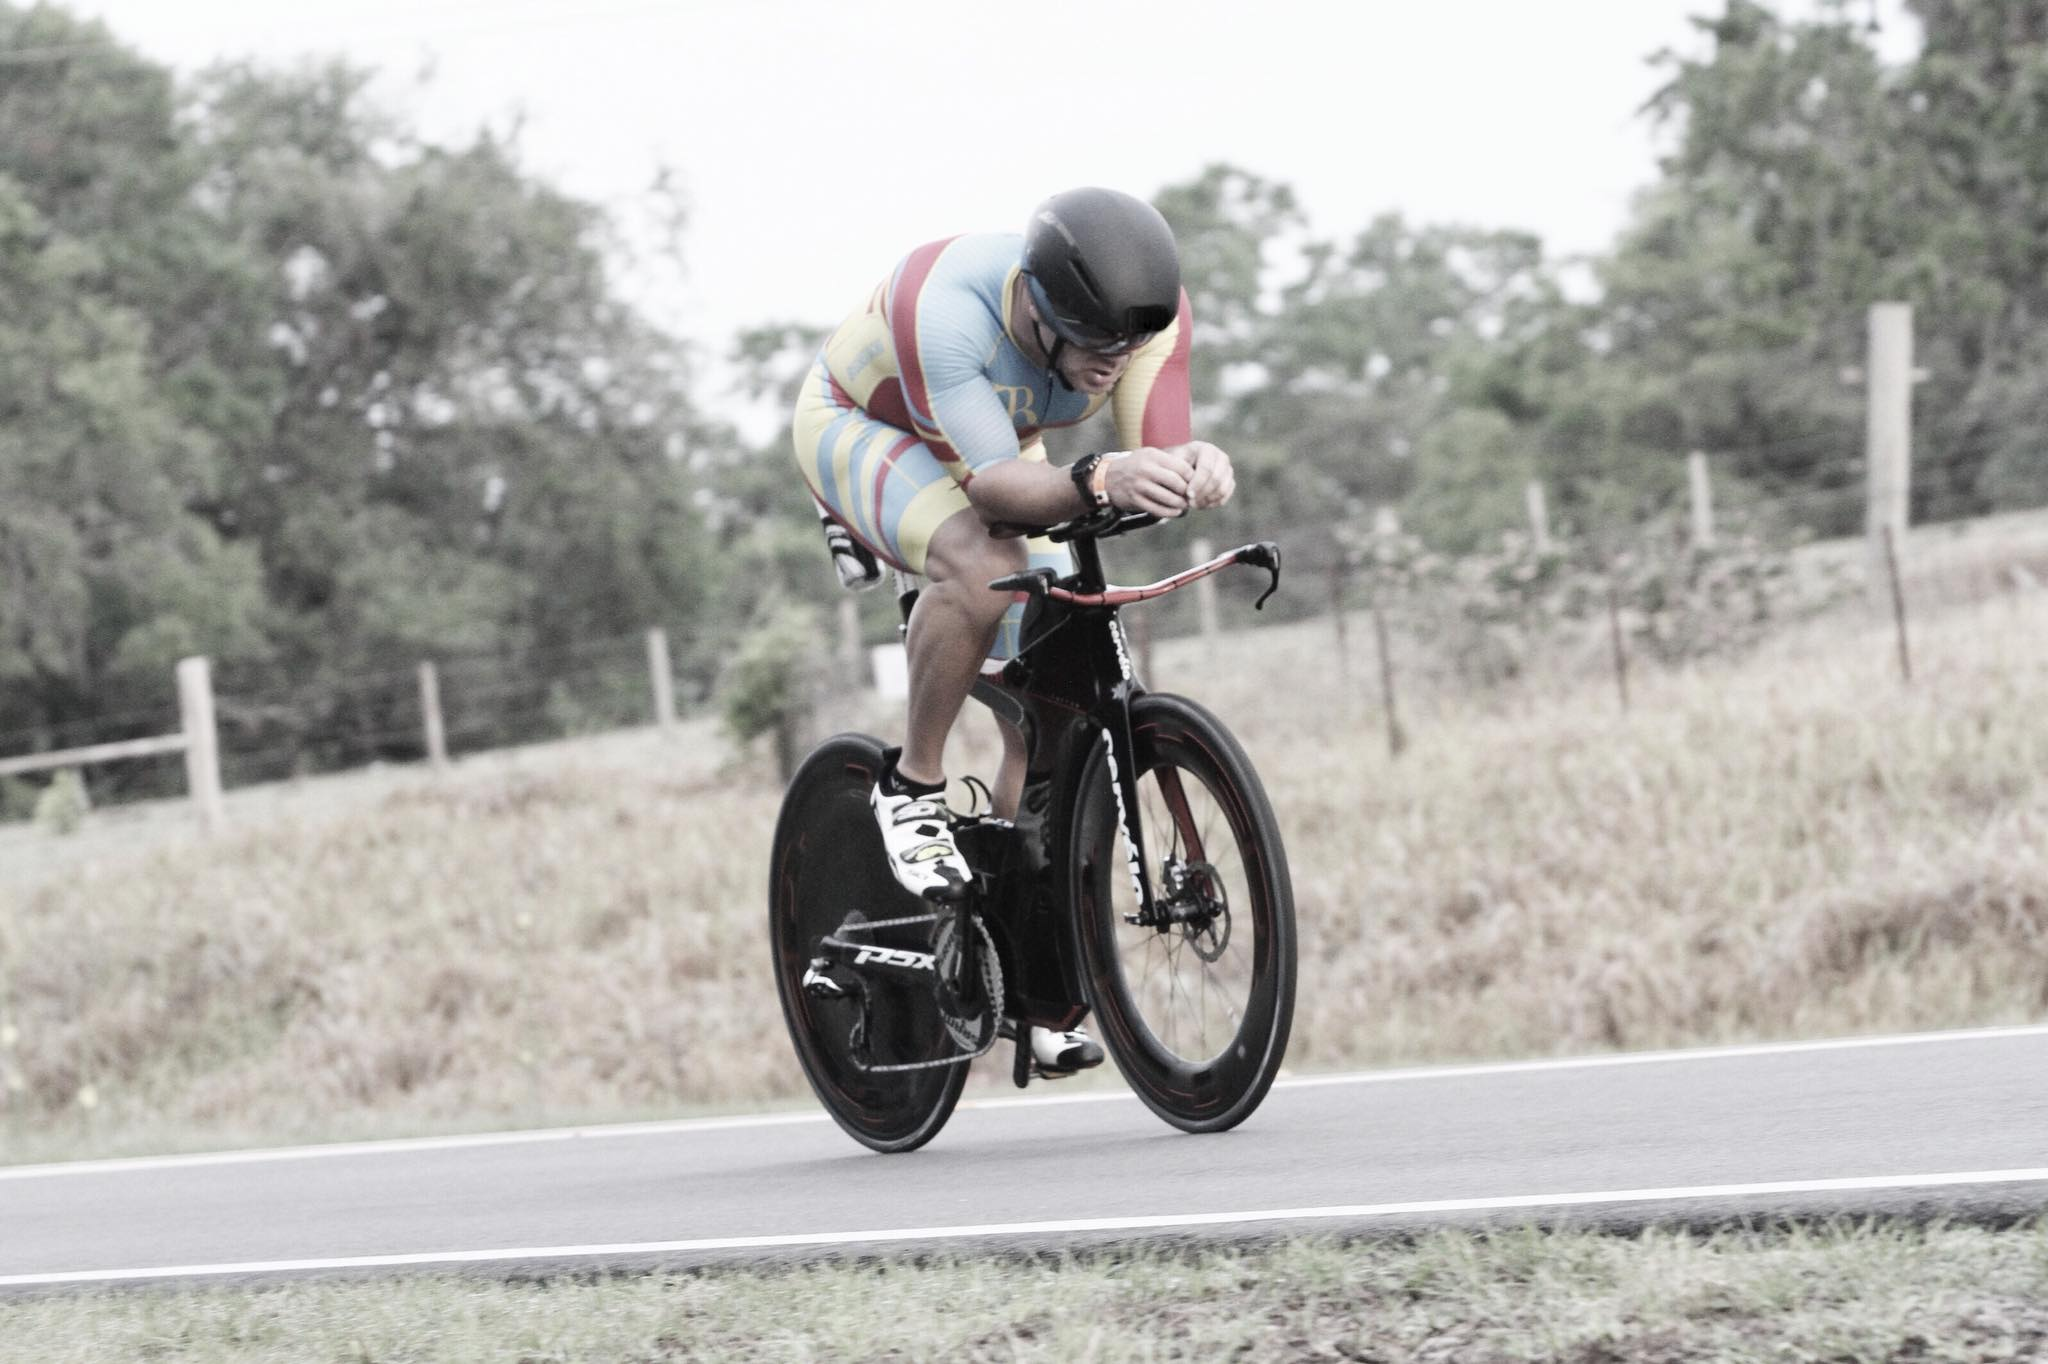 Coach_Terry_Wilson_Ben_Miller_Ironman_70.3_Haines_City_Bike.jpg